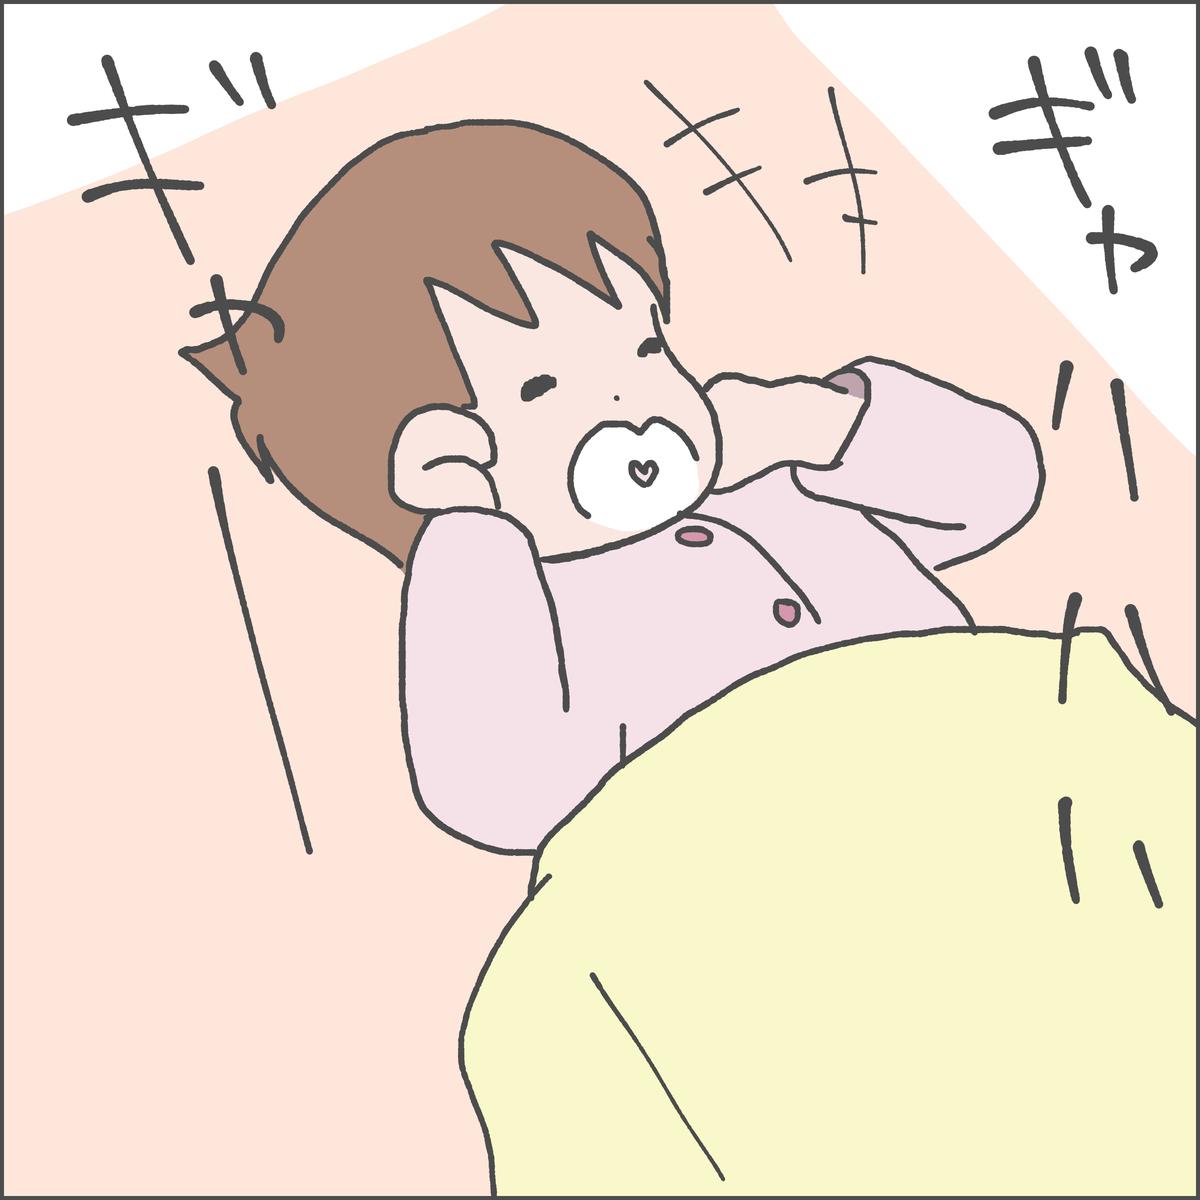 f:id:ika_yoshi:20210223222526j:plain